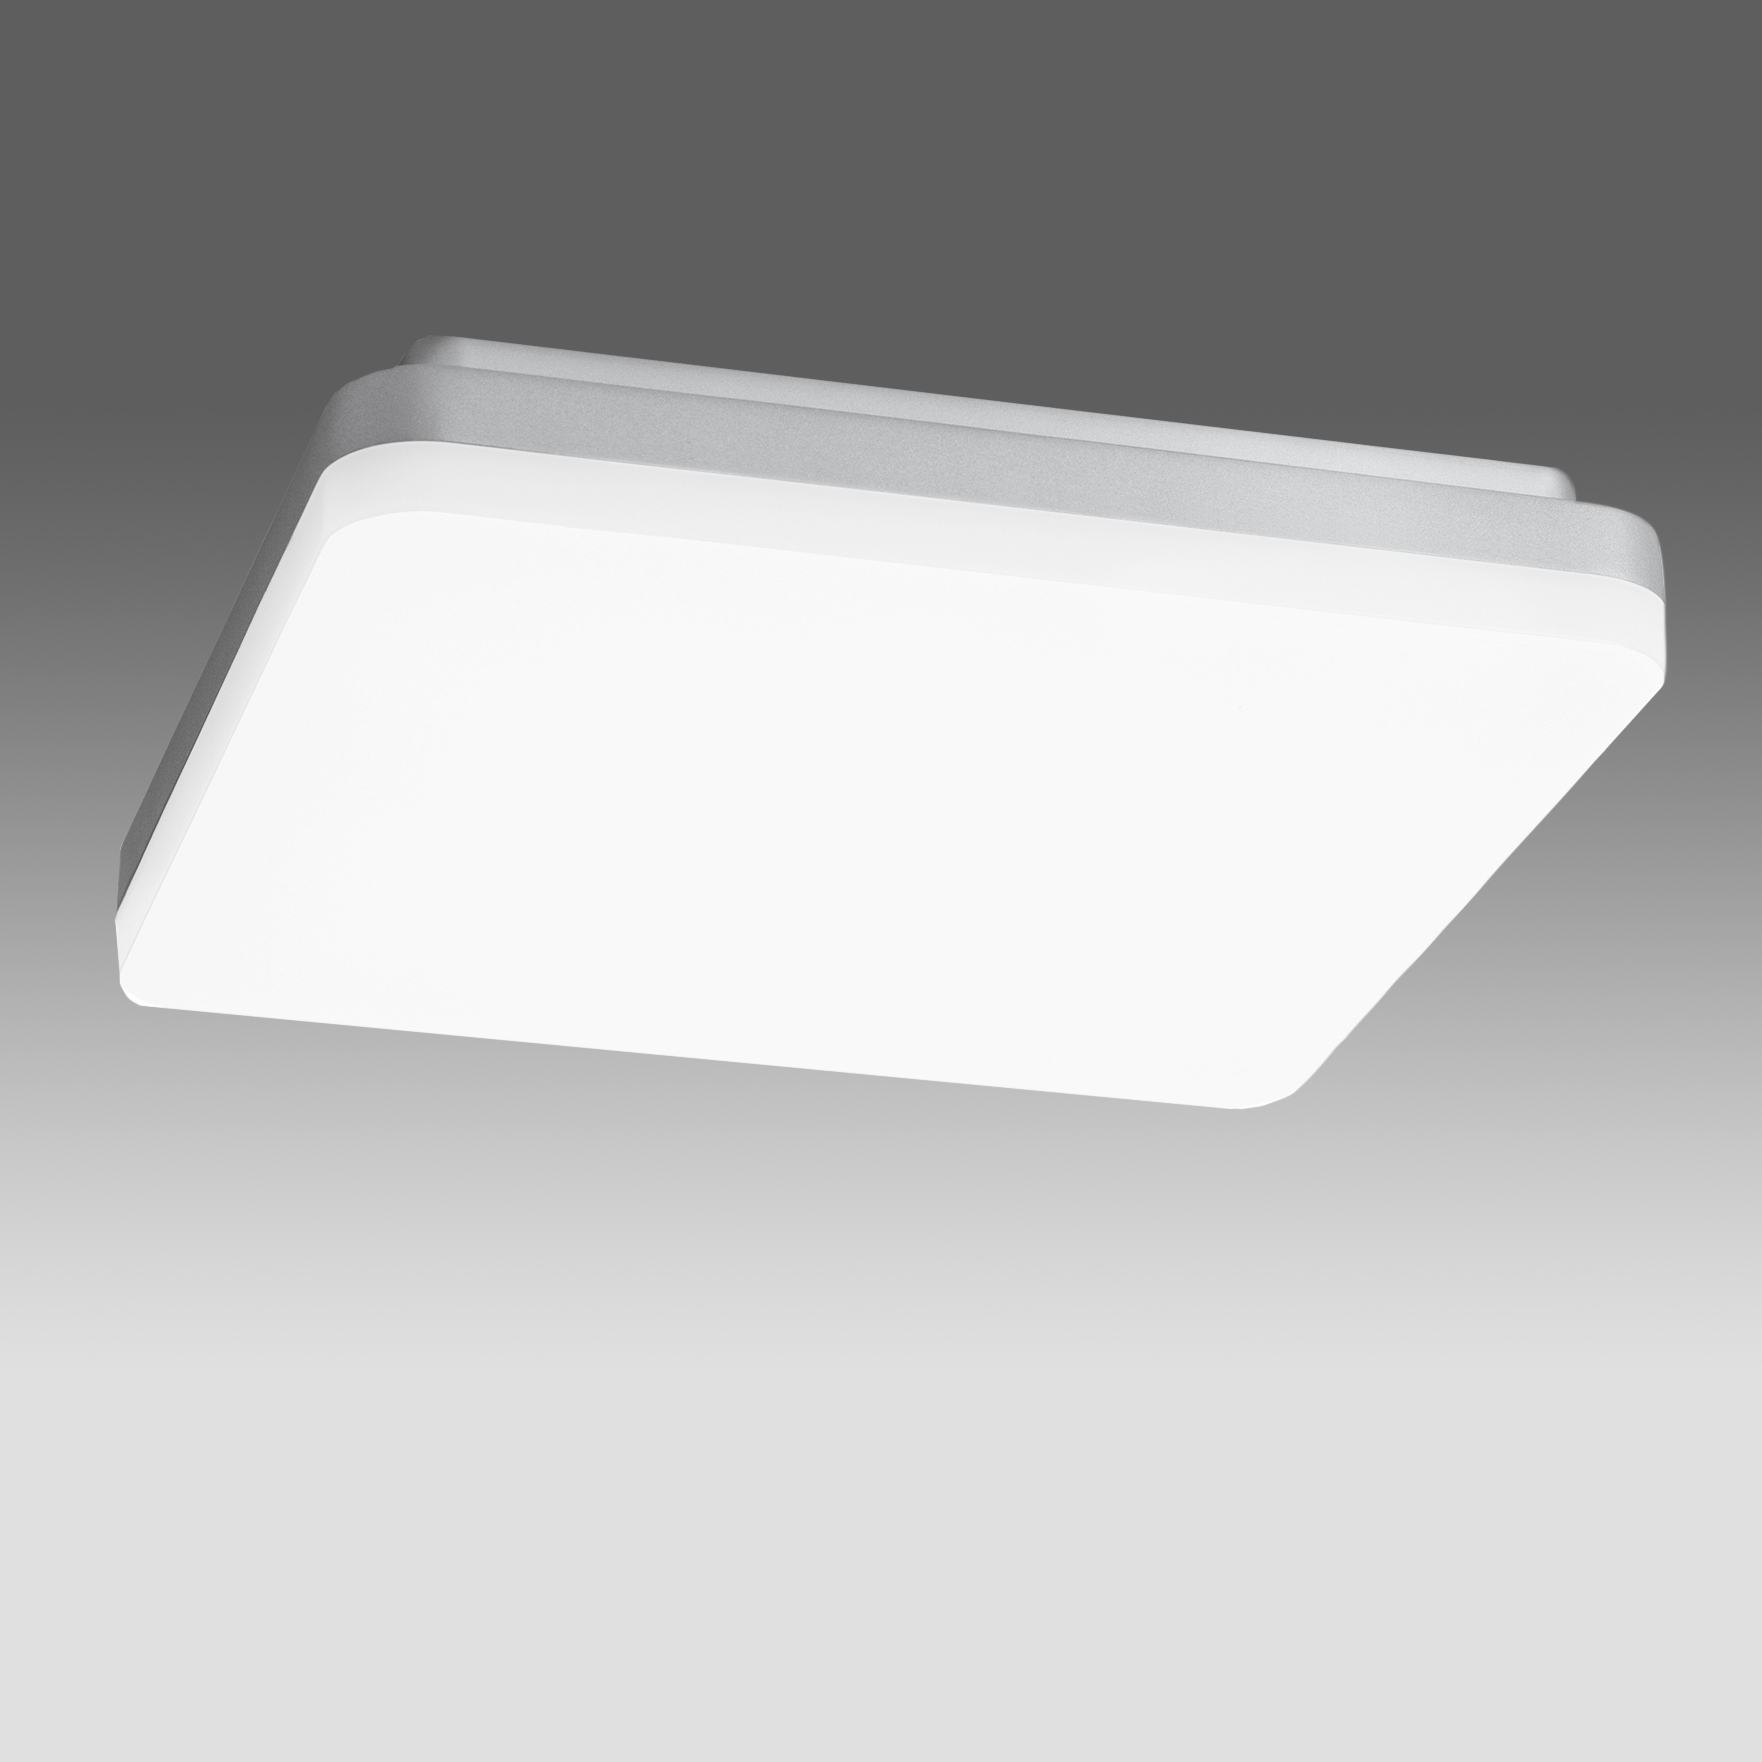 1 Stk Elegance Square III 27W 2800lm 4000K EVG IP20 silber LILE0036--